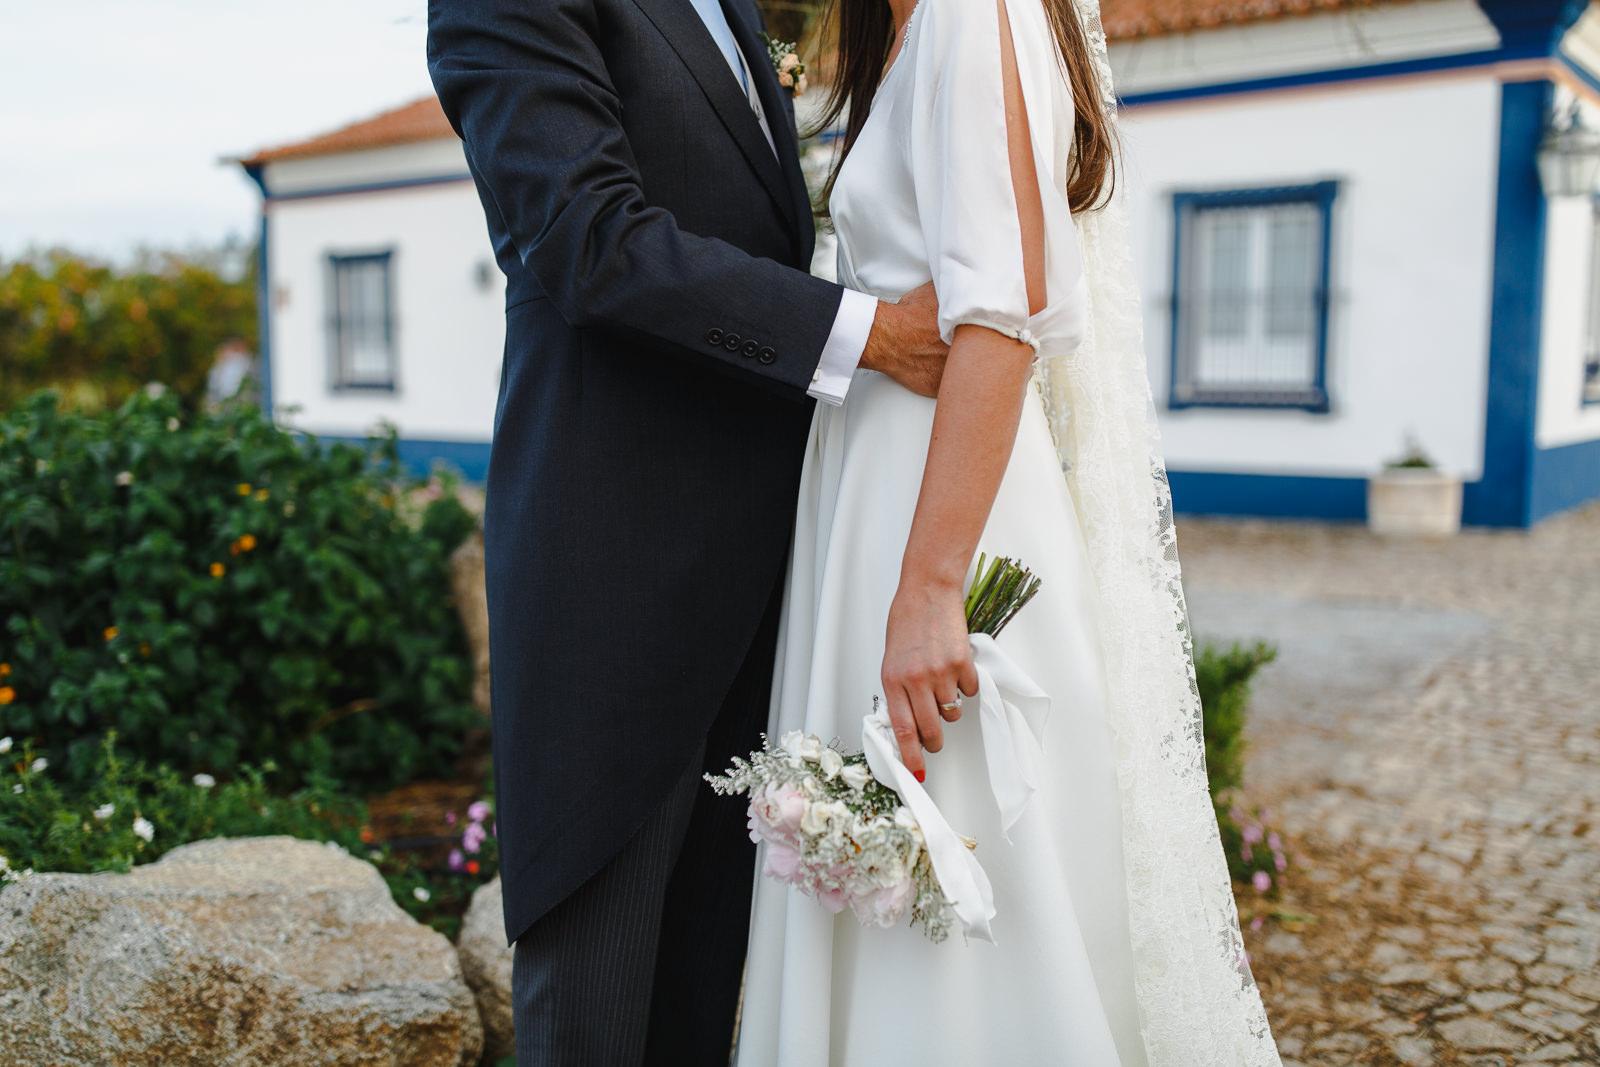 casamento_Ana_e_Carlos_5D2_0199.jpg